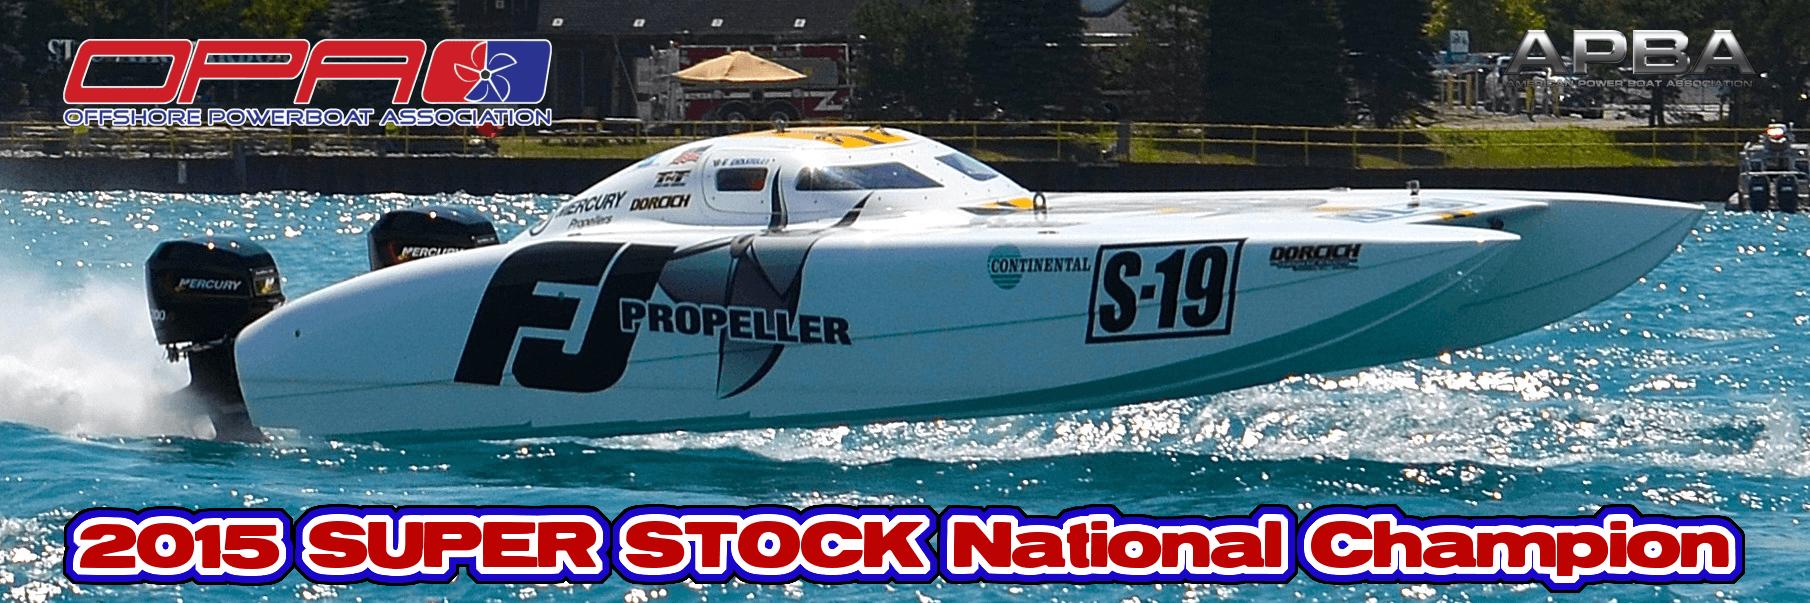 SS FJ Propeller.png